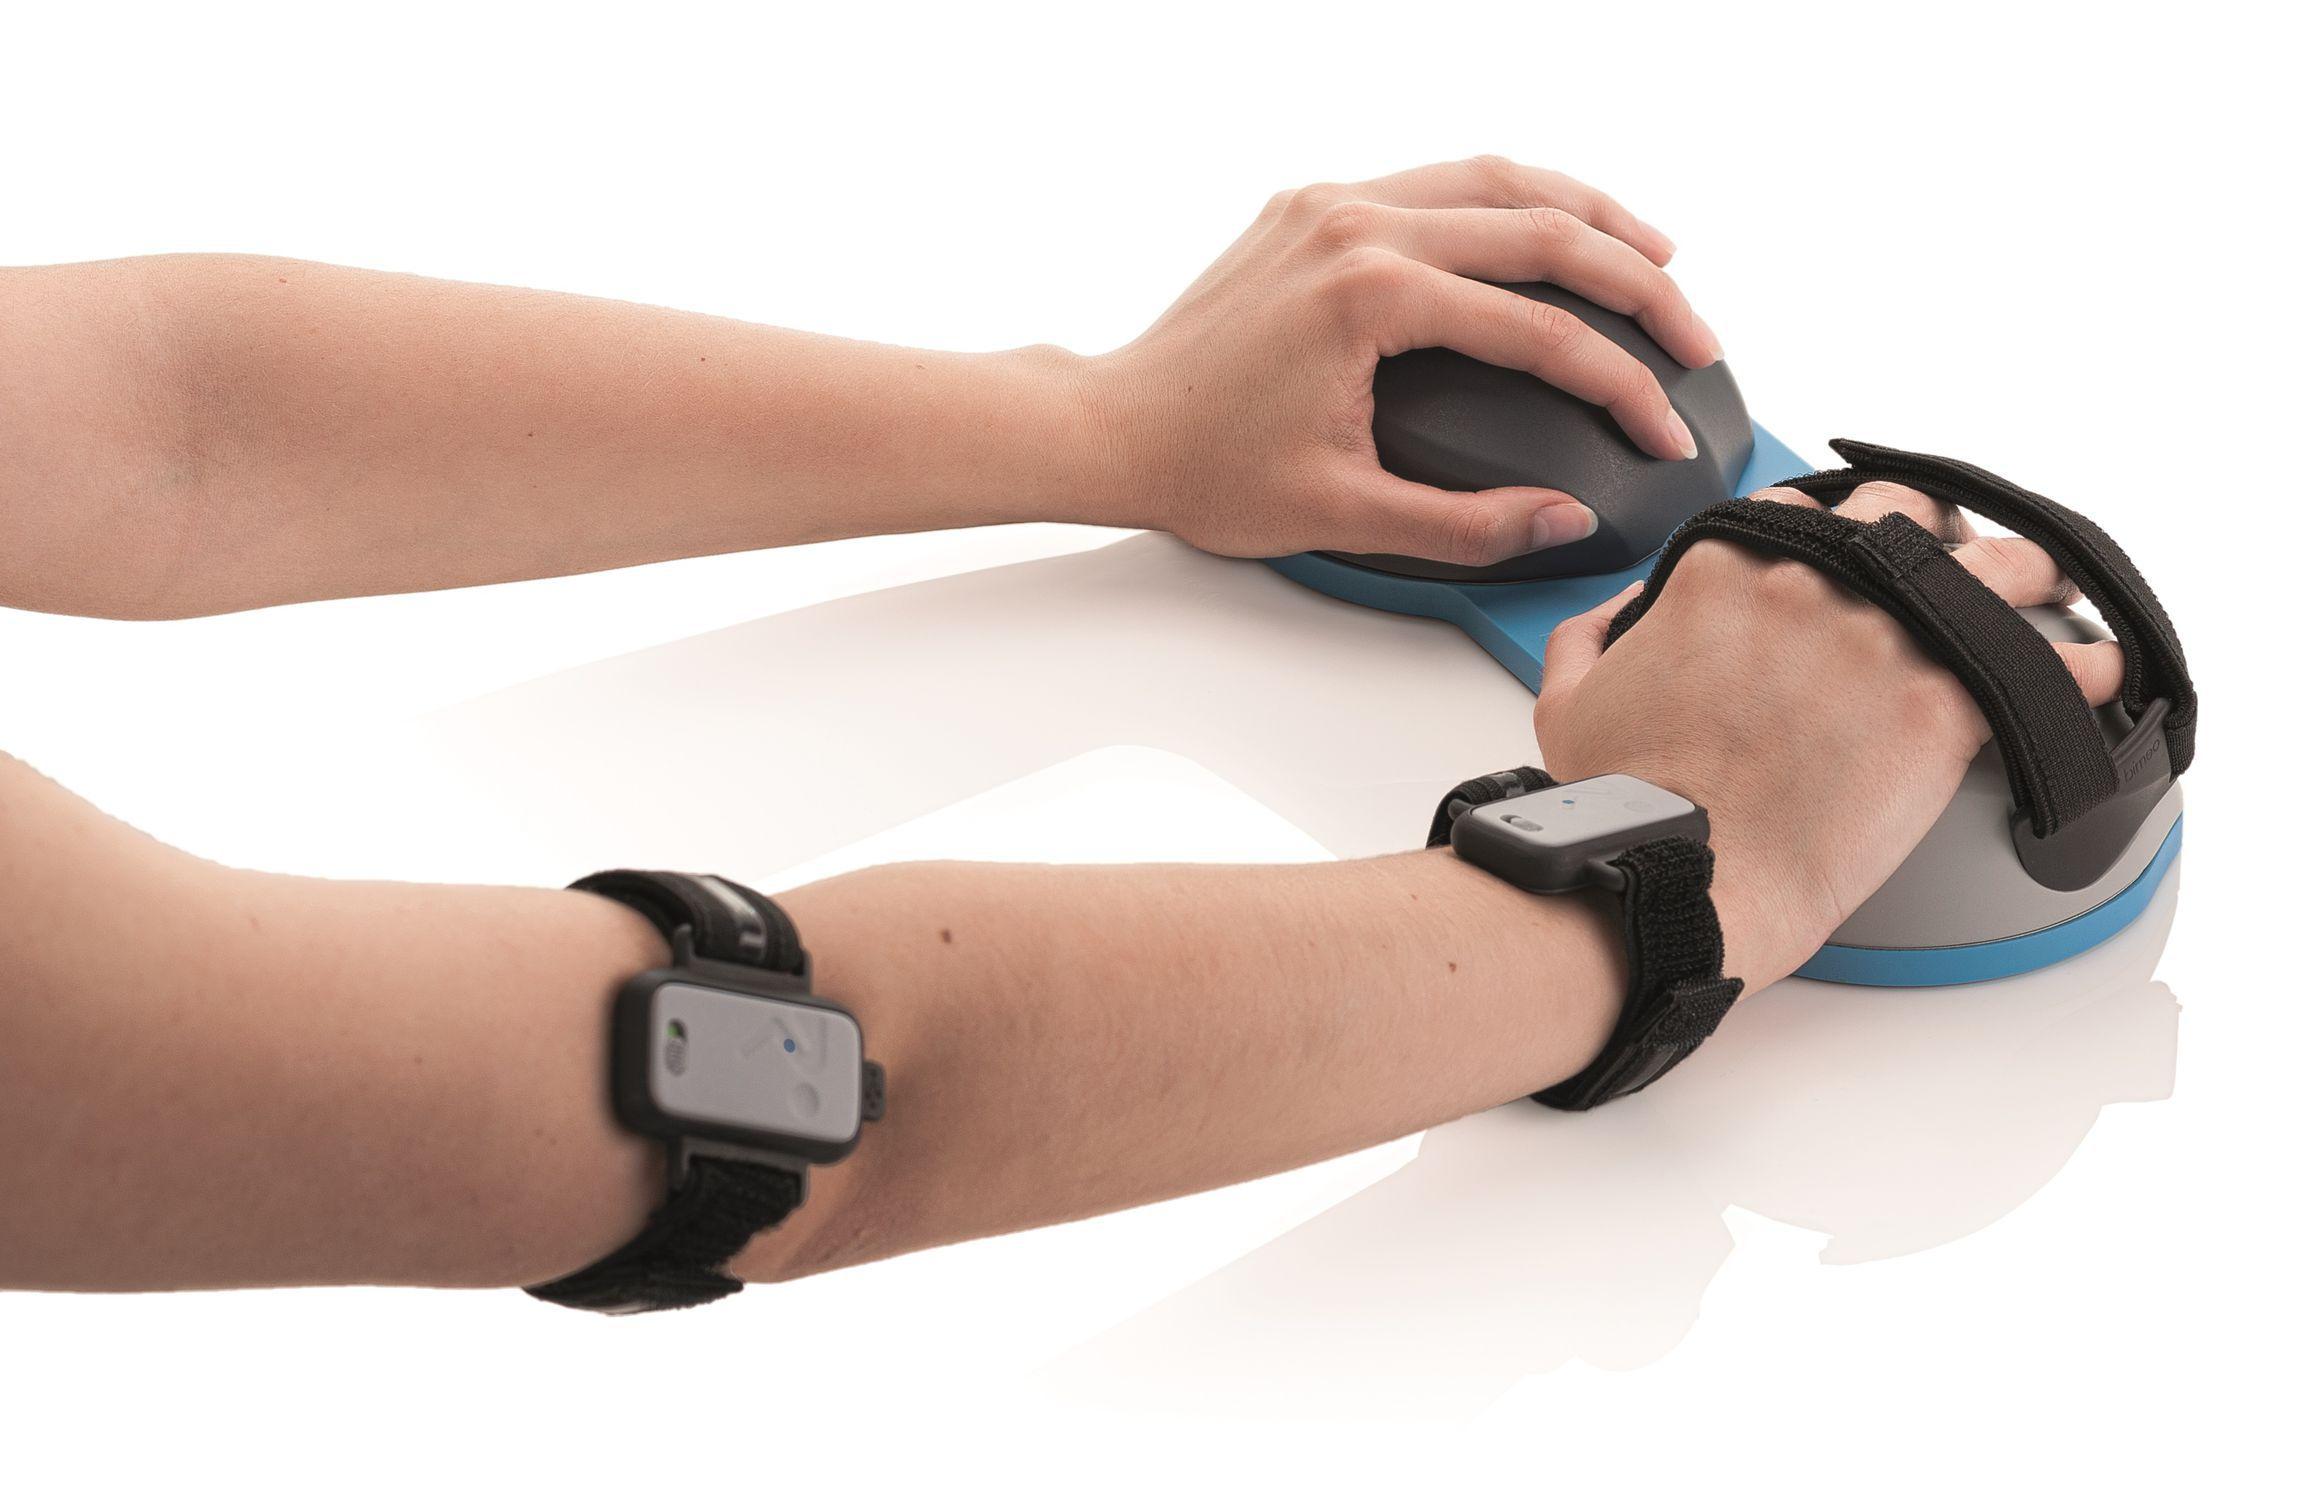 Arm rehabilitation system / hand / adult / computer-based